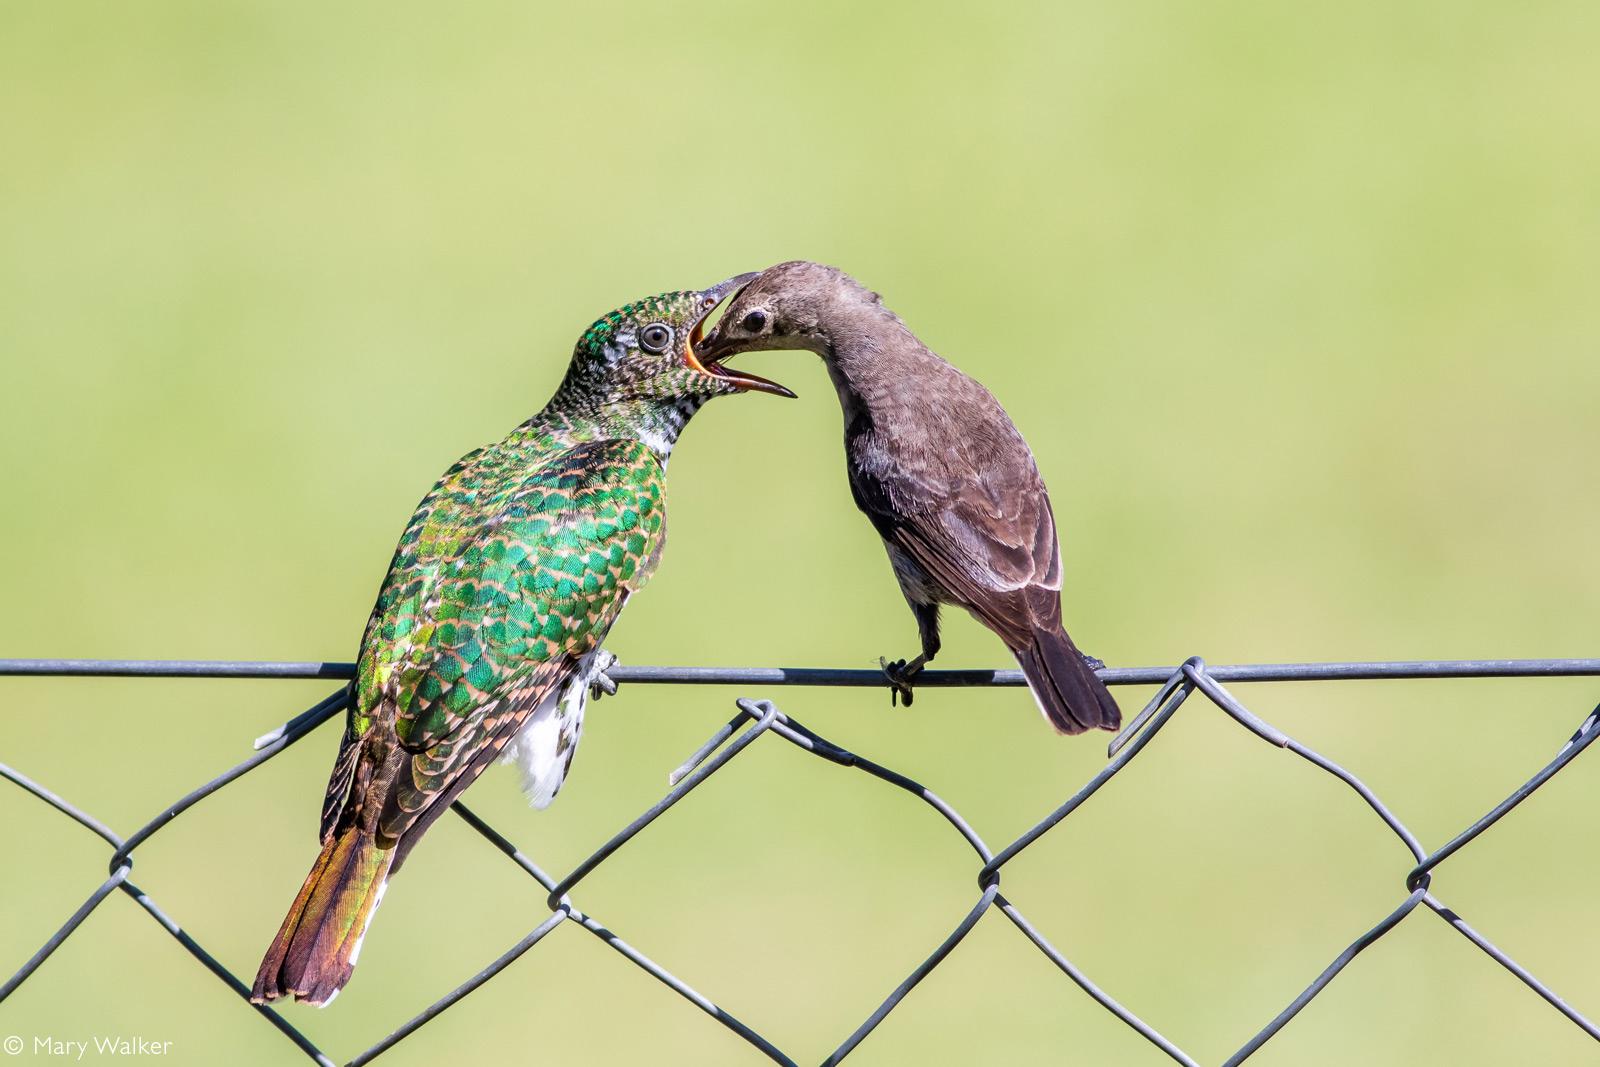 Klaas's cuckoo being fed by a female malachite sunbird. Riebeek Kasteel, South Africa © Mary Walker